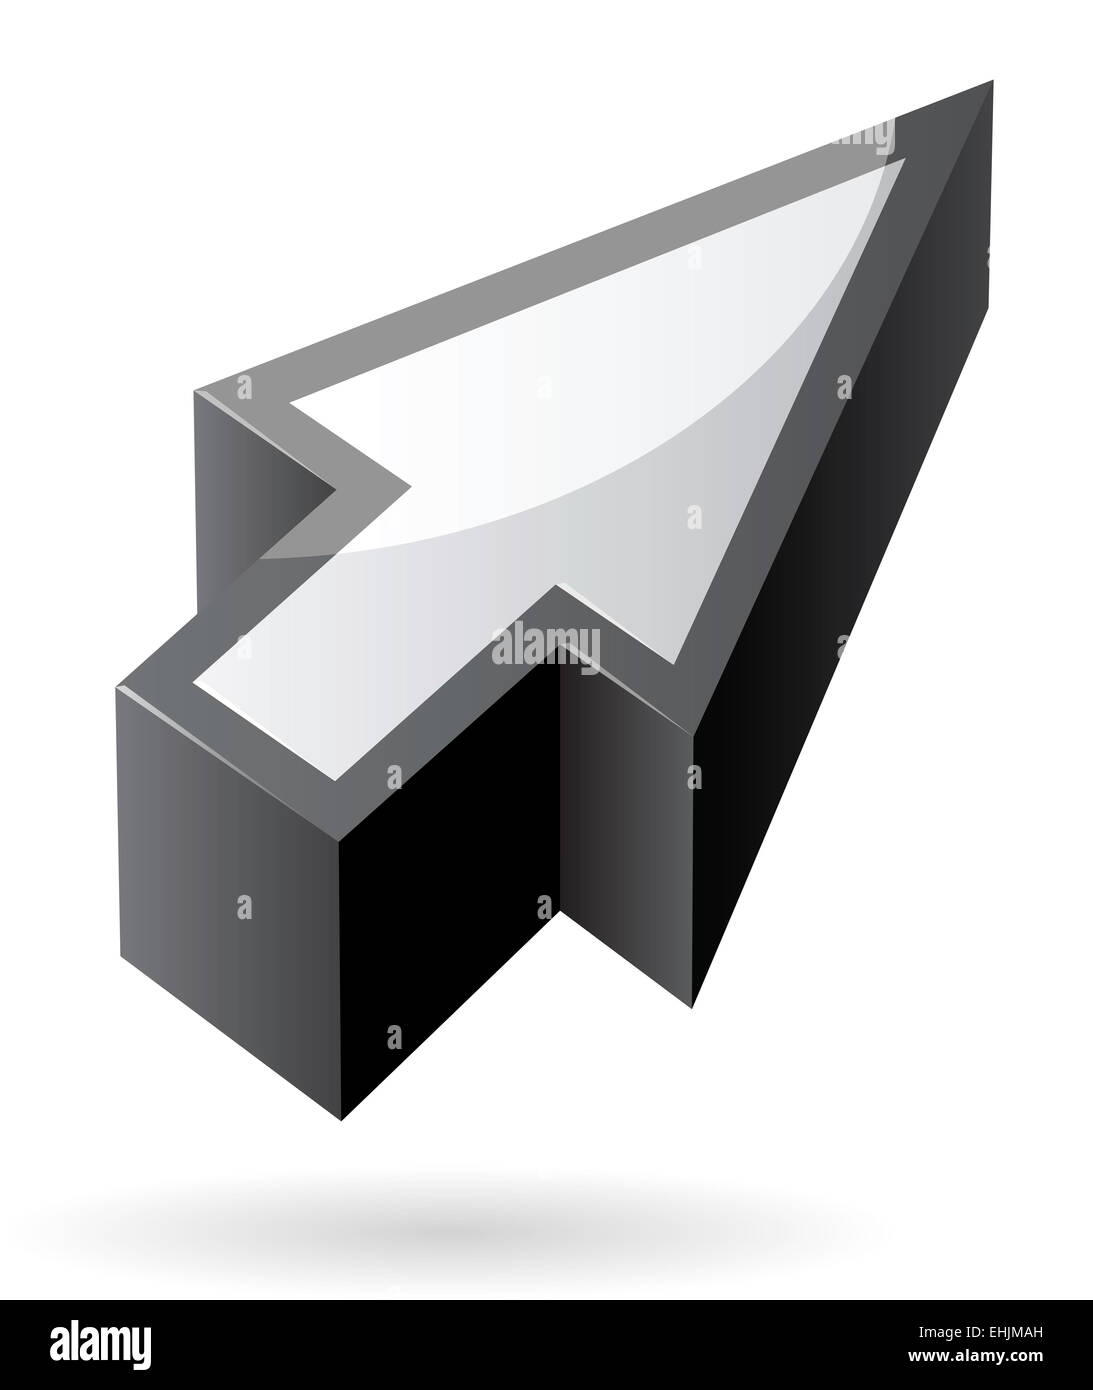 Isometric icon of cursor - Stock Image